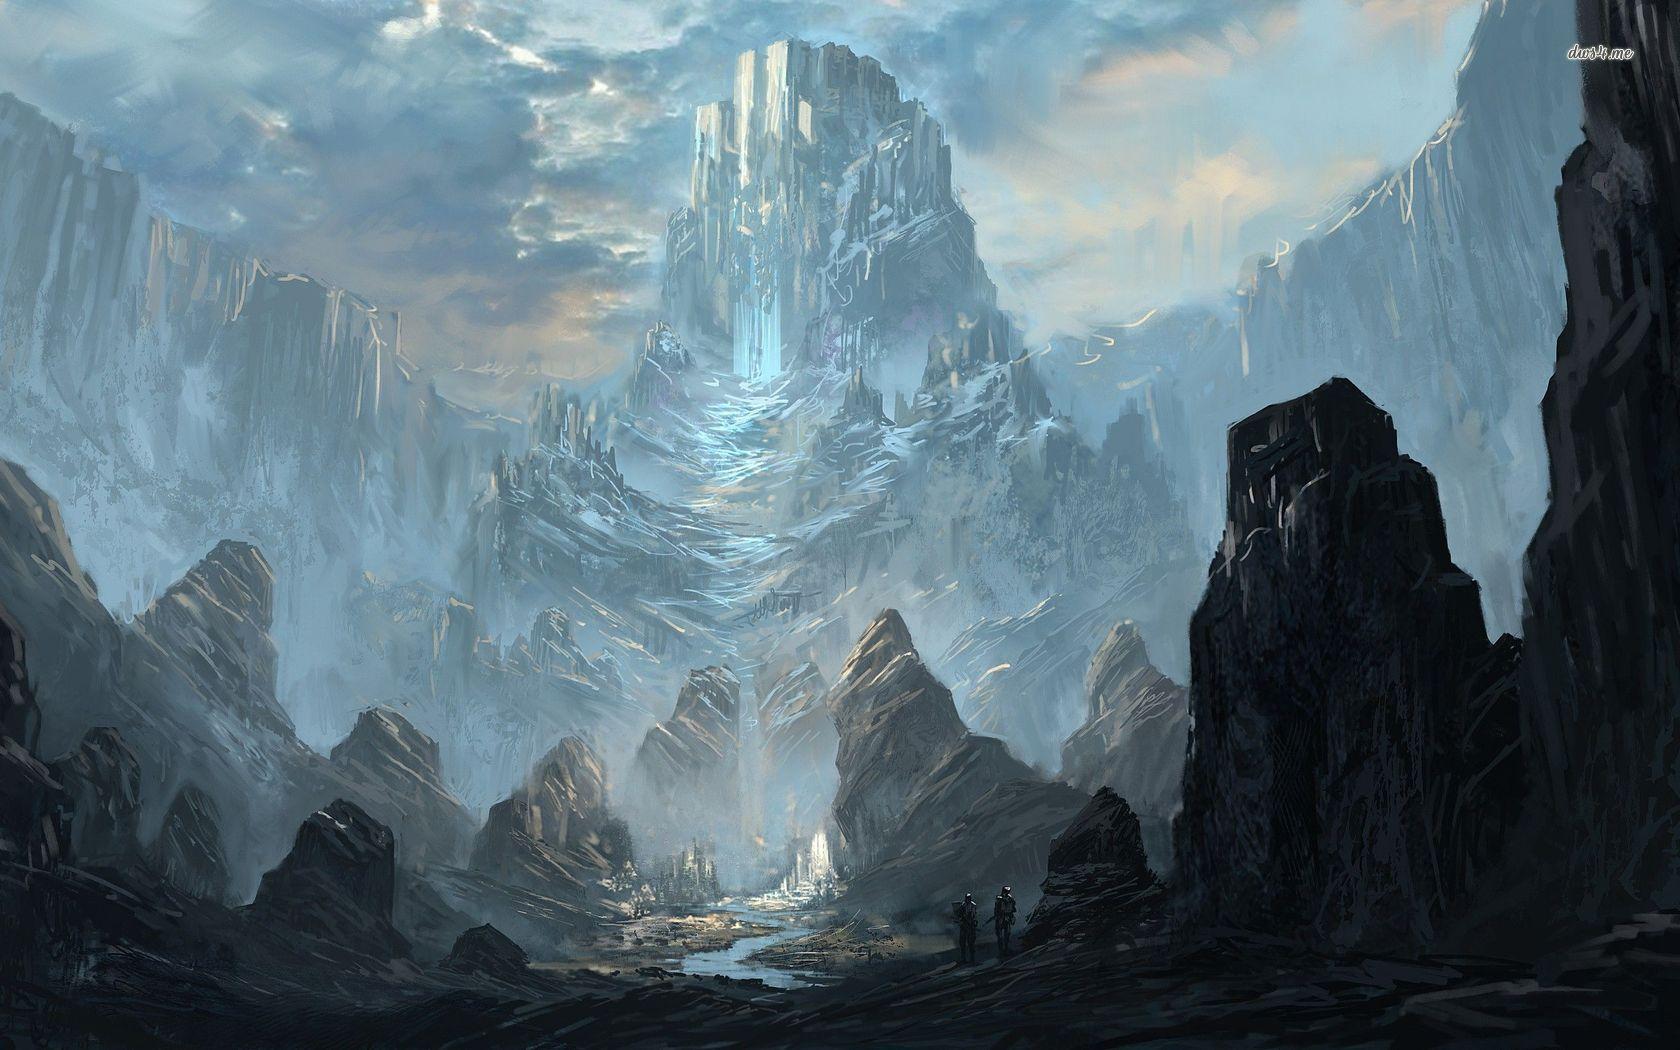 Cool Wallpaper Mountain Fantasy - latest?cb\u003d20150727211502  2018_918485.jpg/revision/latest?cb\u003d20150727211502